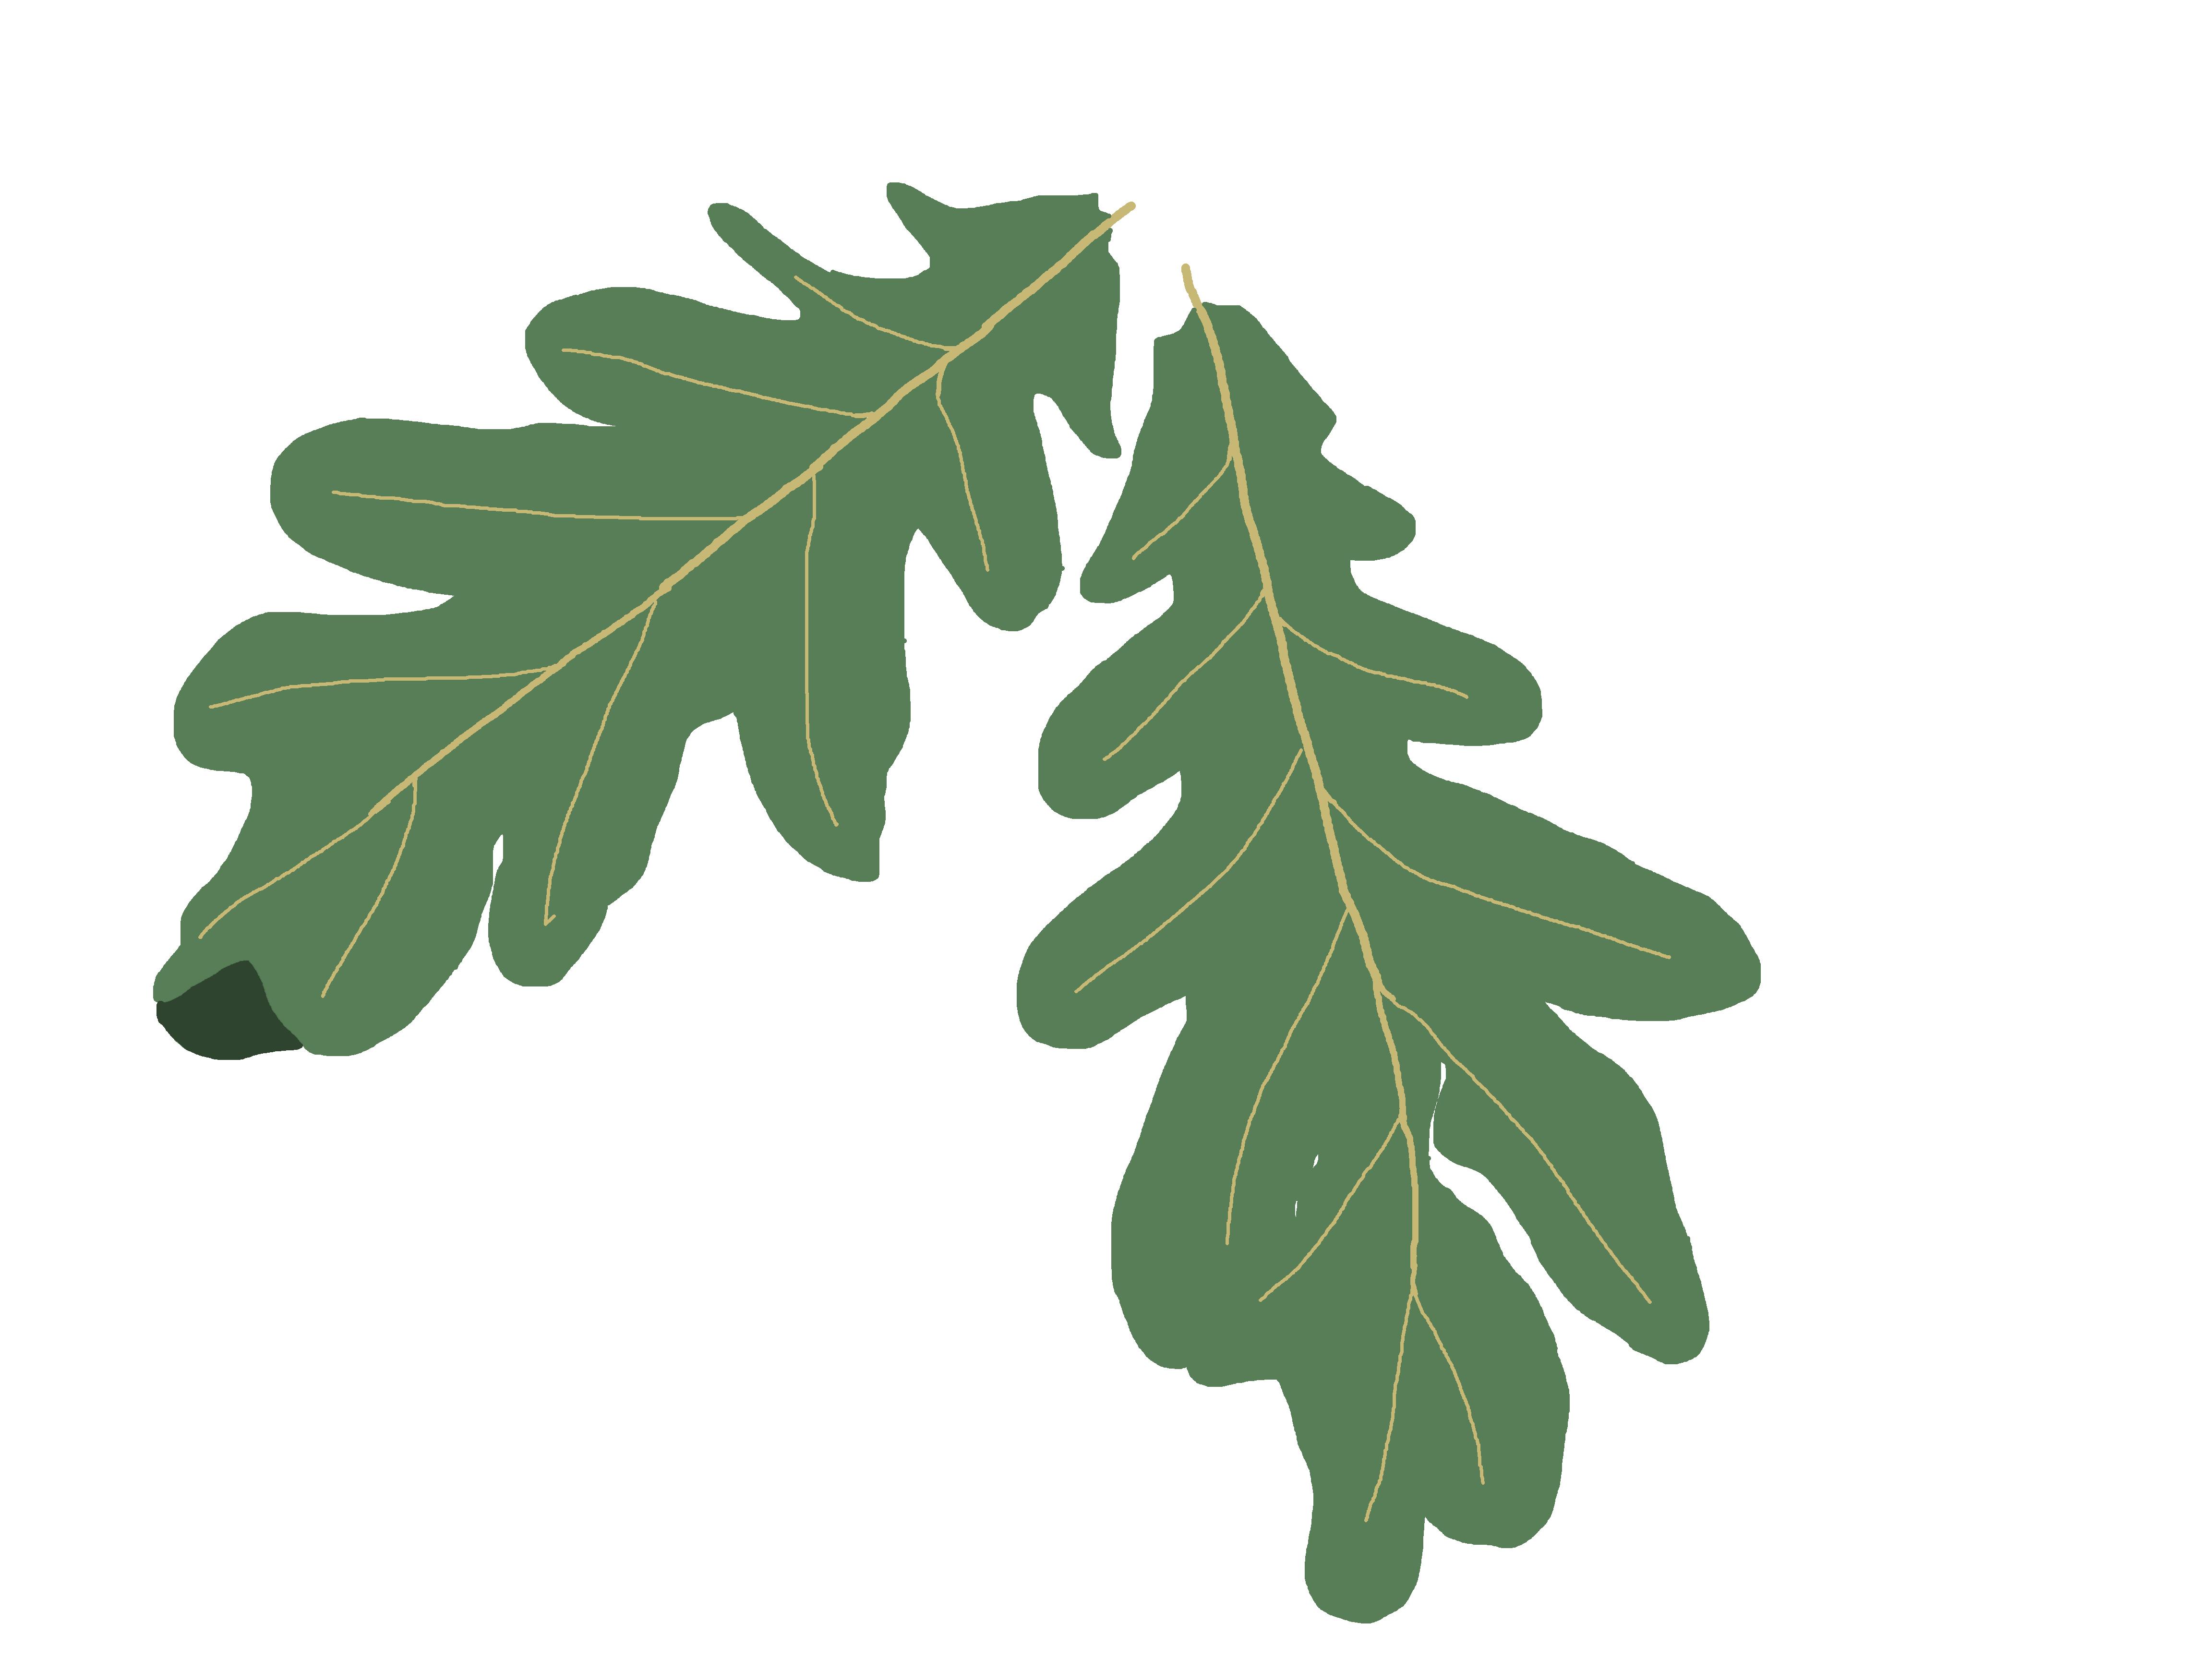 Clipart leaf oak tree, Clipart leaf oak tree Transparent.